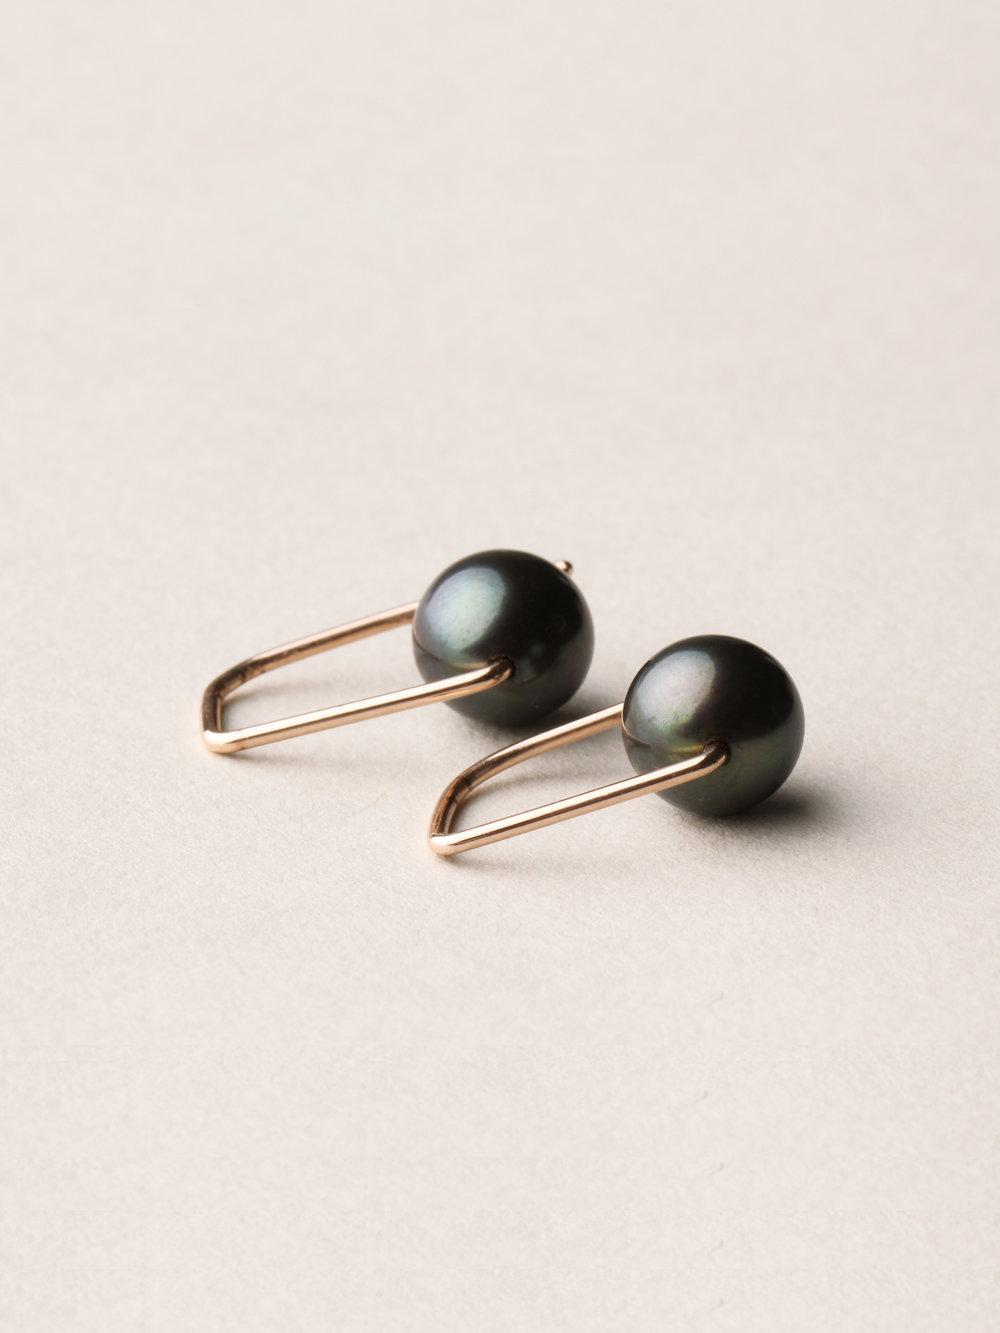 Perlen Ohrhänger, kurz in 585 Rosegold und echten Süßwasserzuchtperlen  Pearl earrings, short in 14kt Rosegold and sweetwater pearls